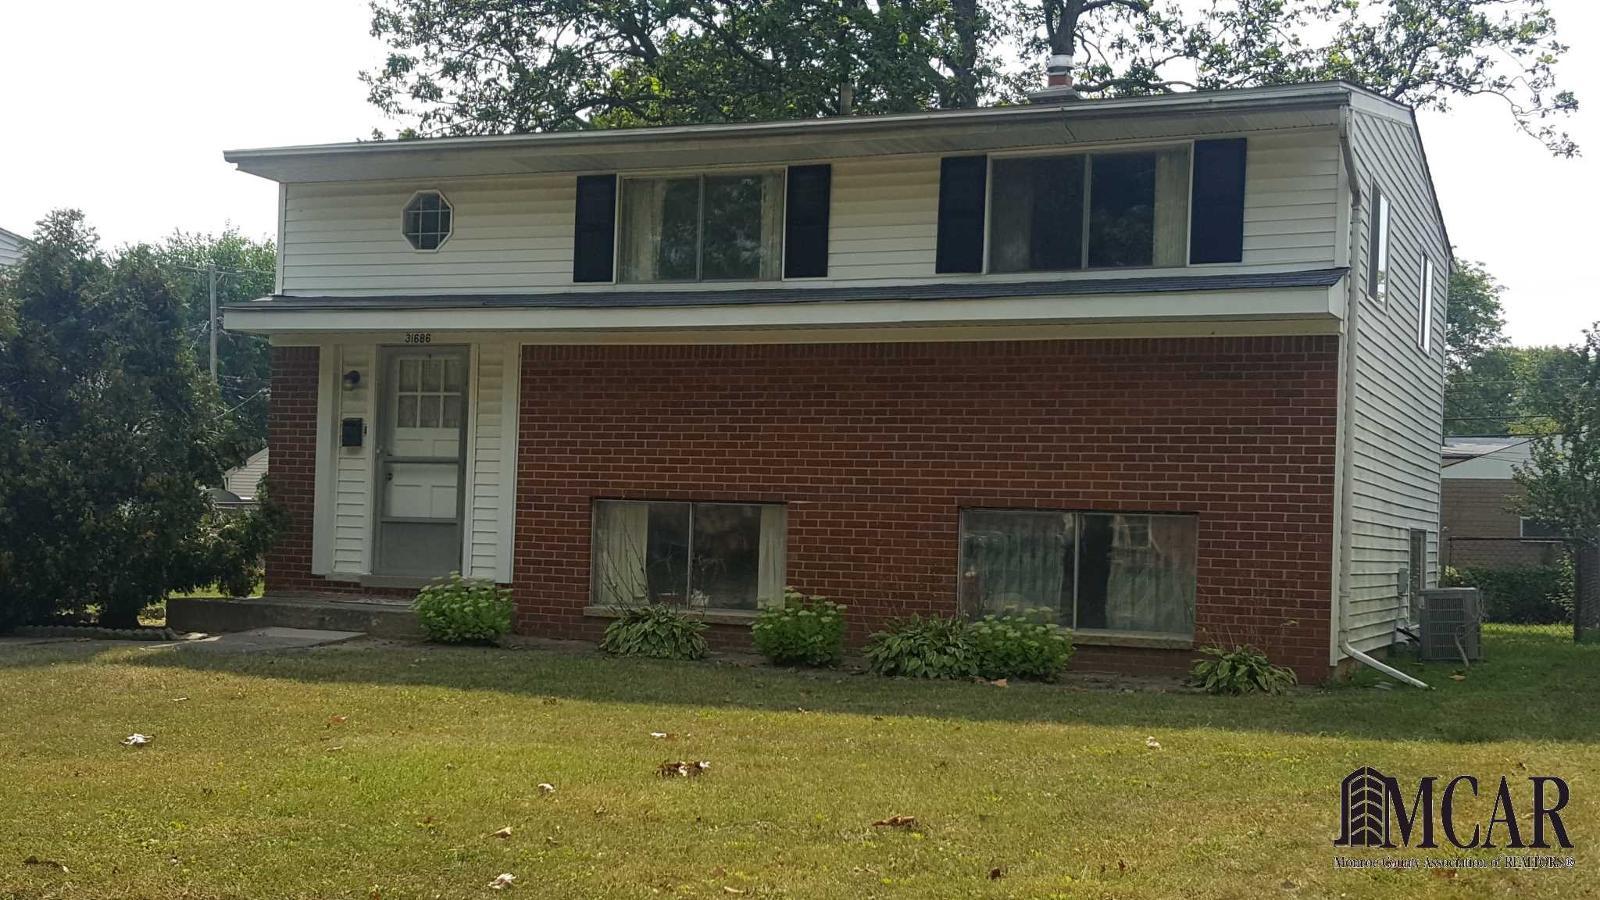 Local Real Estate: Homes for Sale — Rockwood, MI — Coldwell Banker